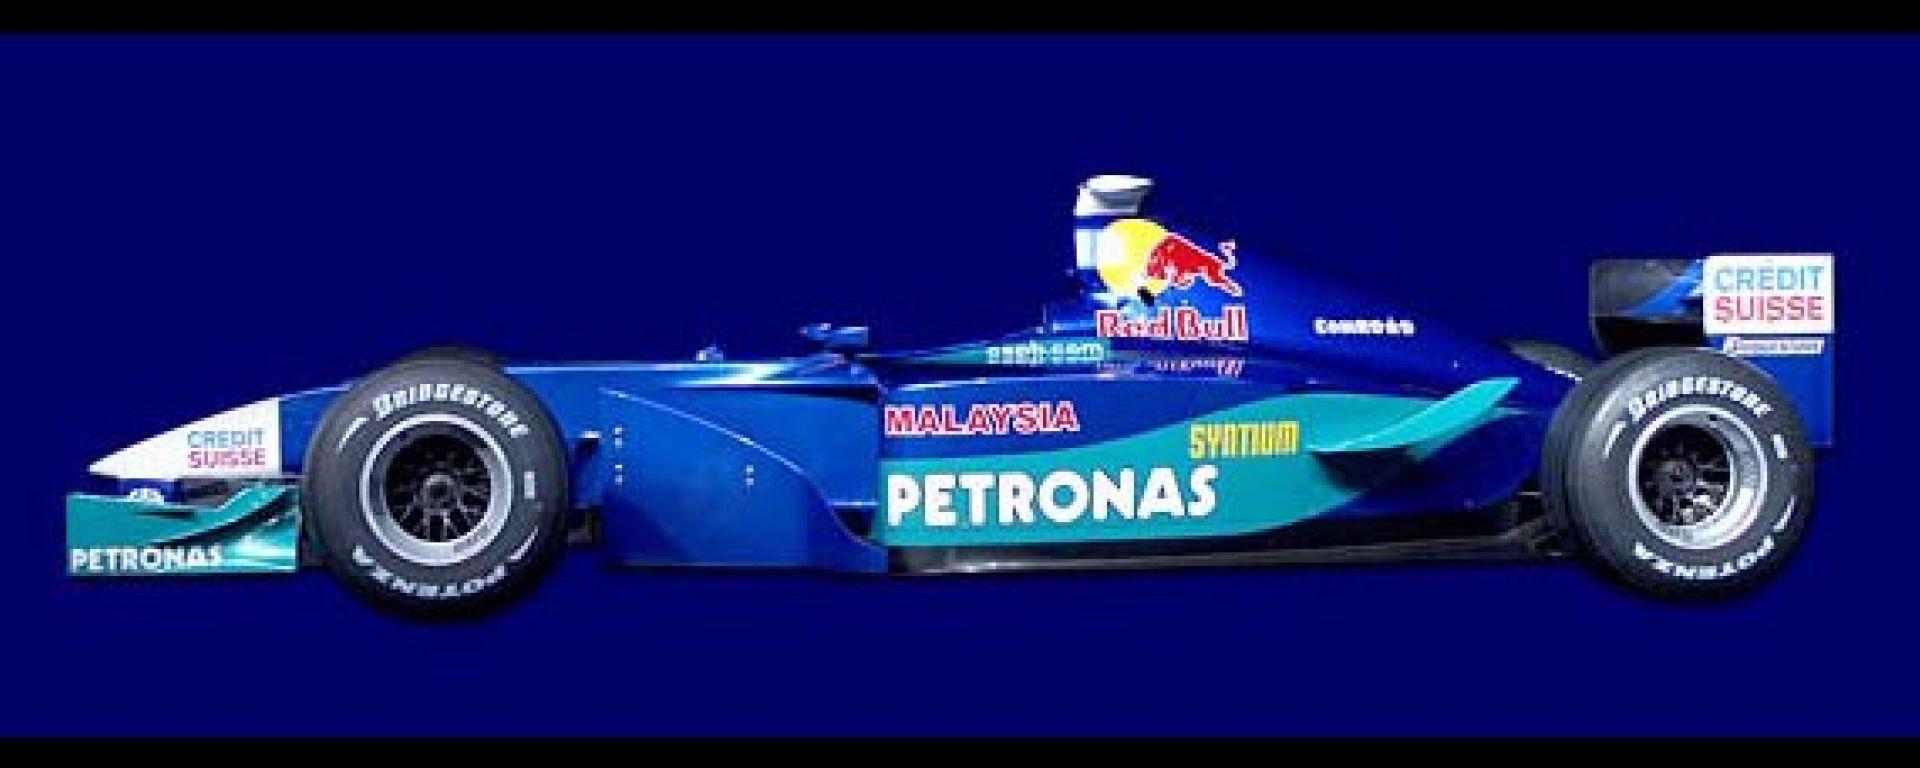 F1 2002: Sauber Petronas C21